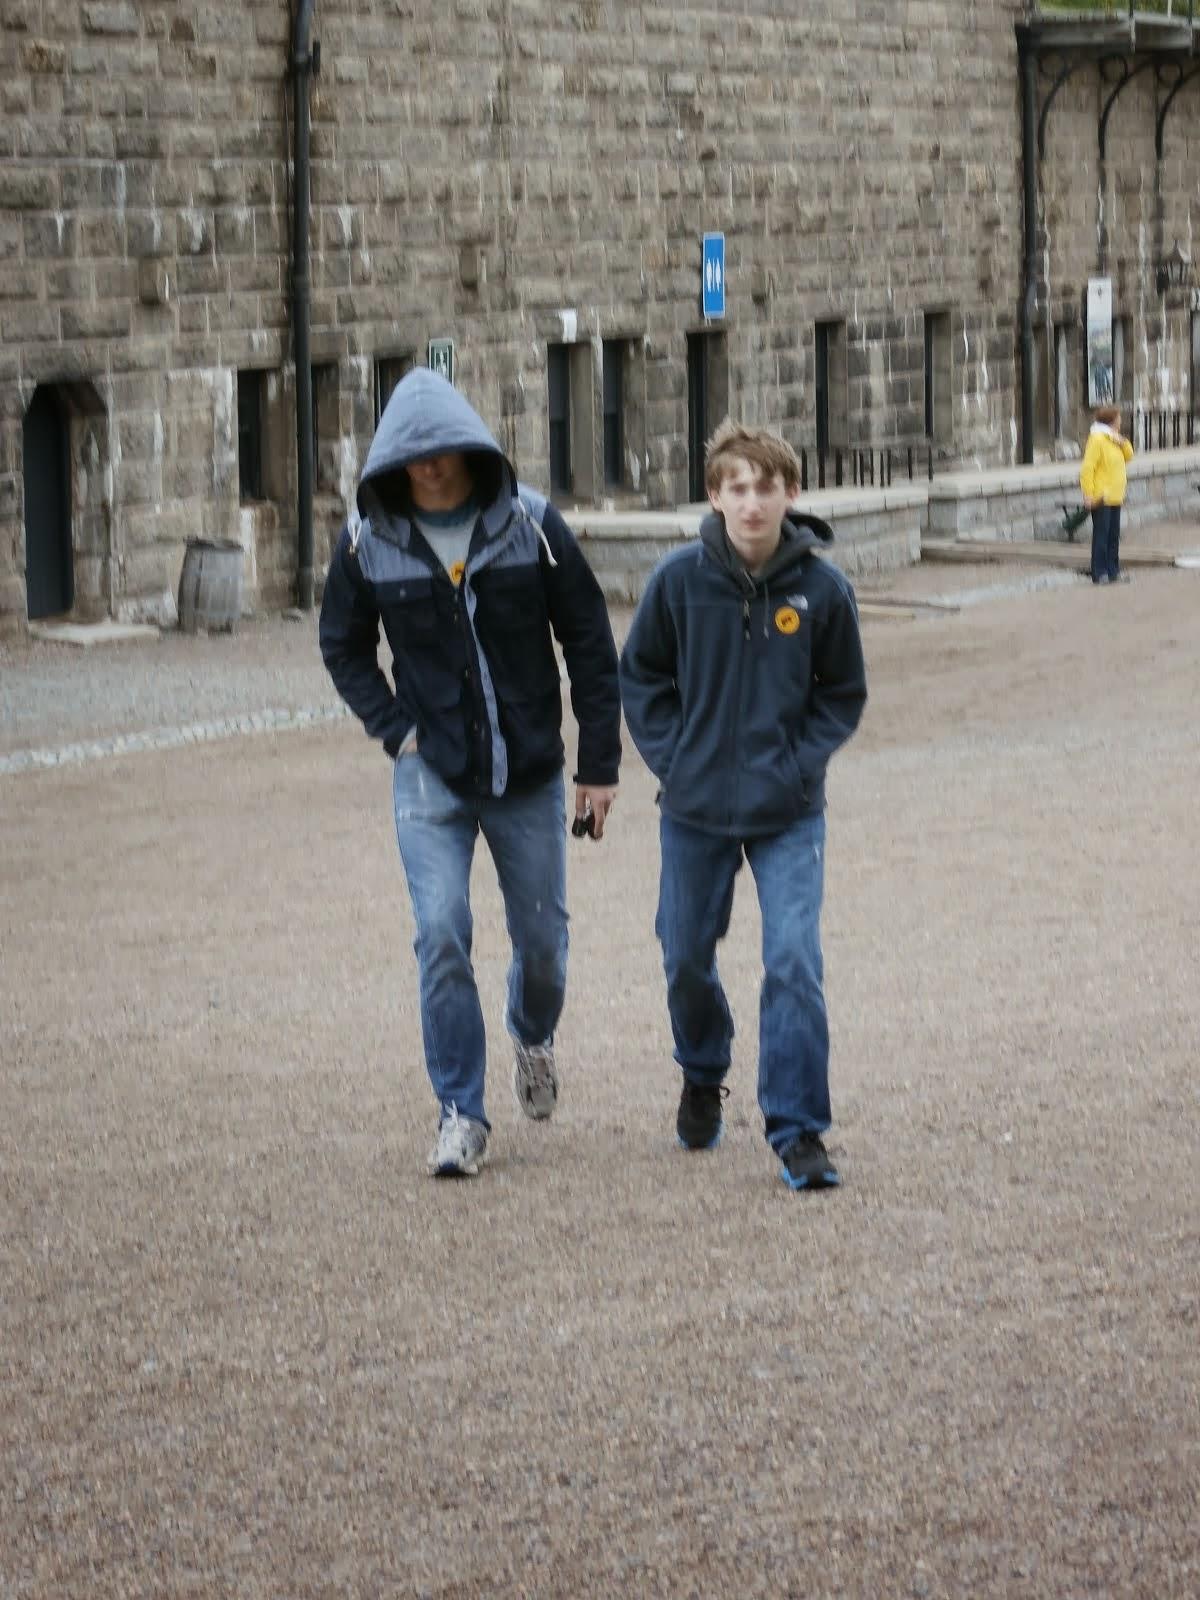 Wandering Boys